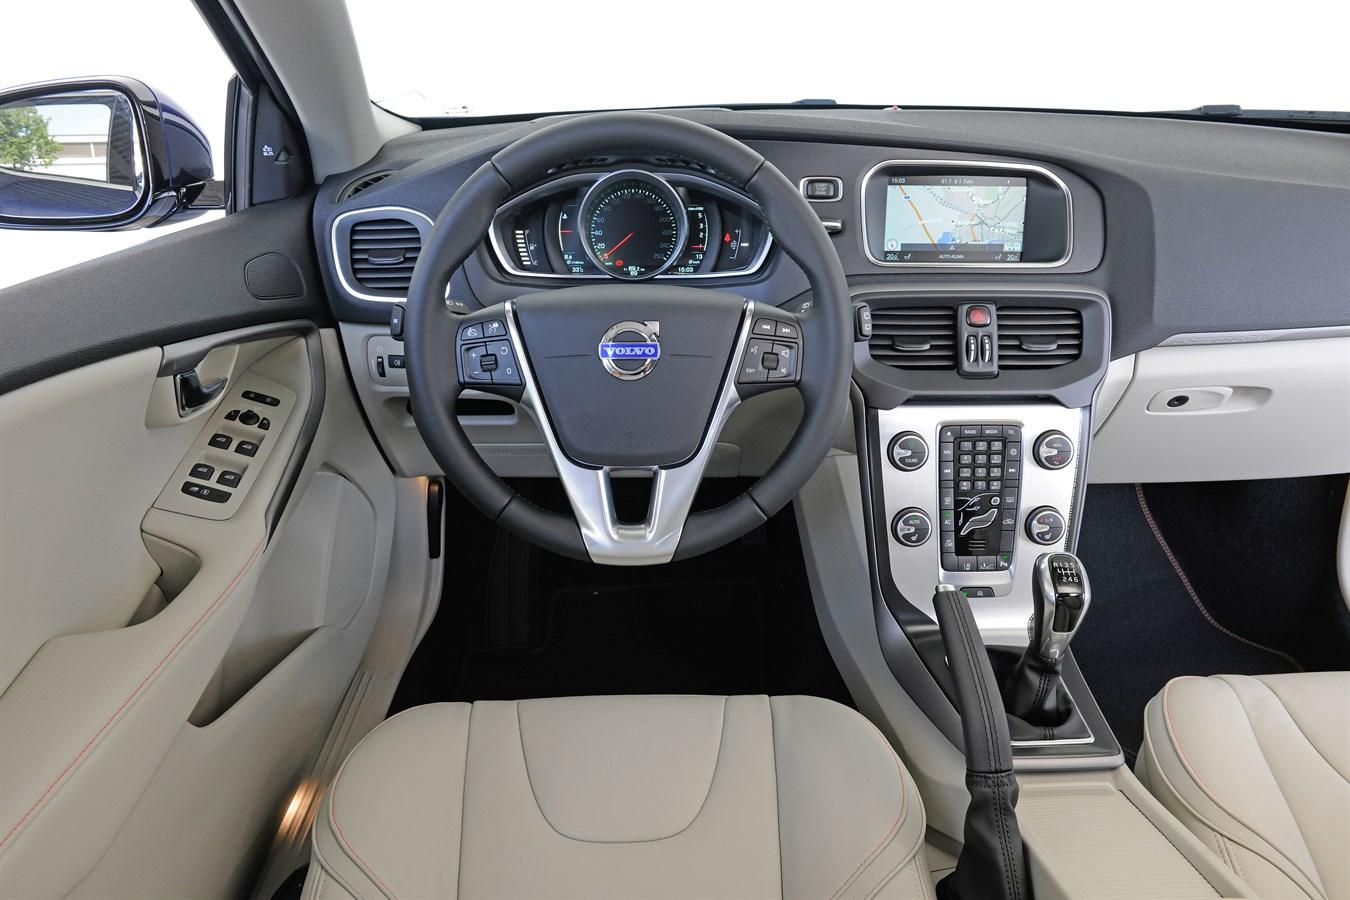 Ongebruikt Volvo V40 Cross Country Ocean Race Edition - Volvo Car Austria BS-22